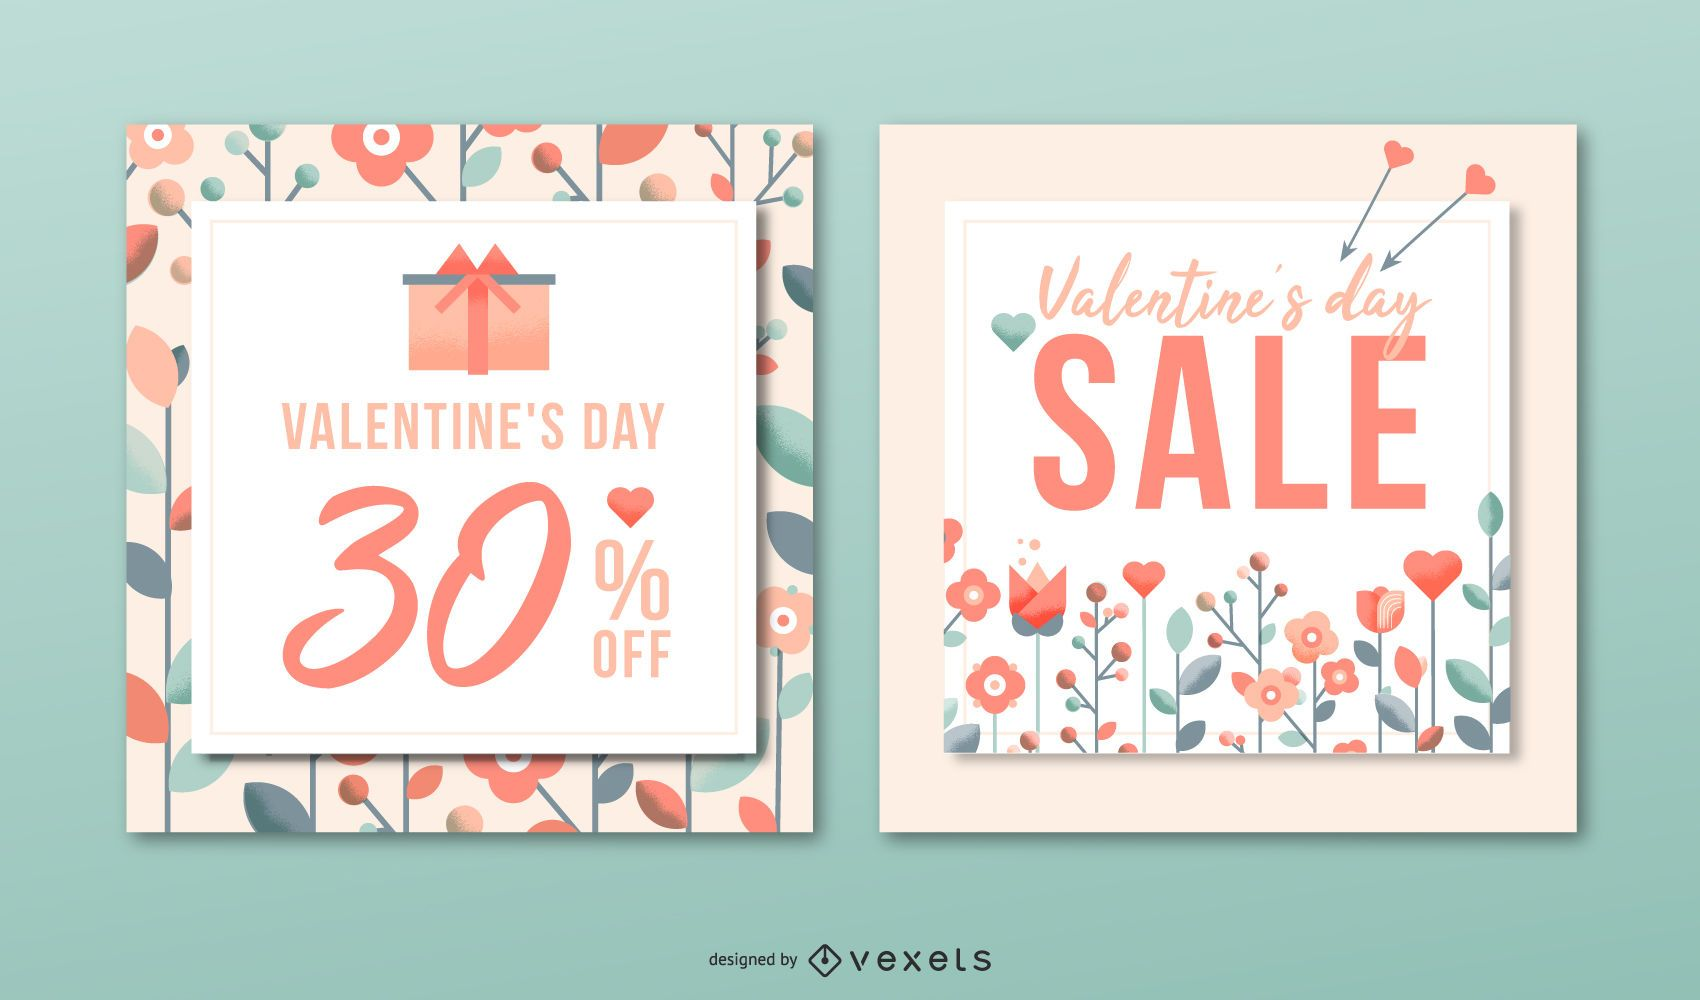 Valenitne's day sale banner set